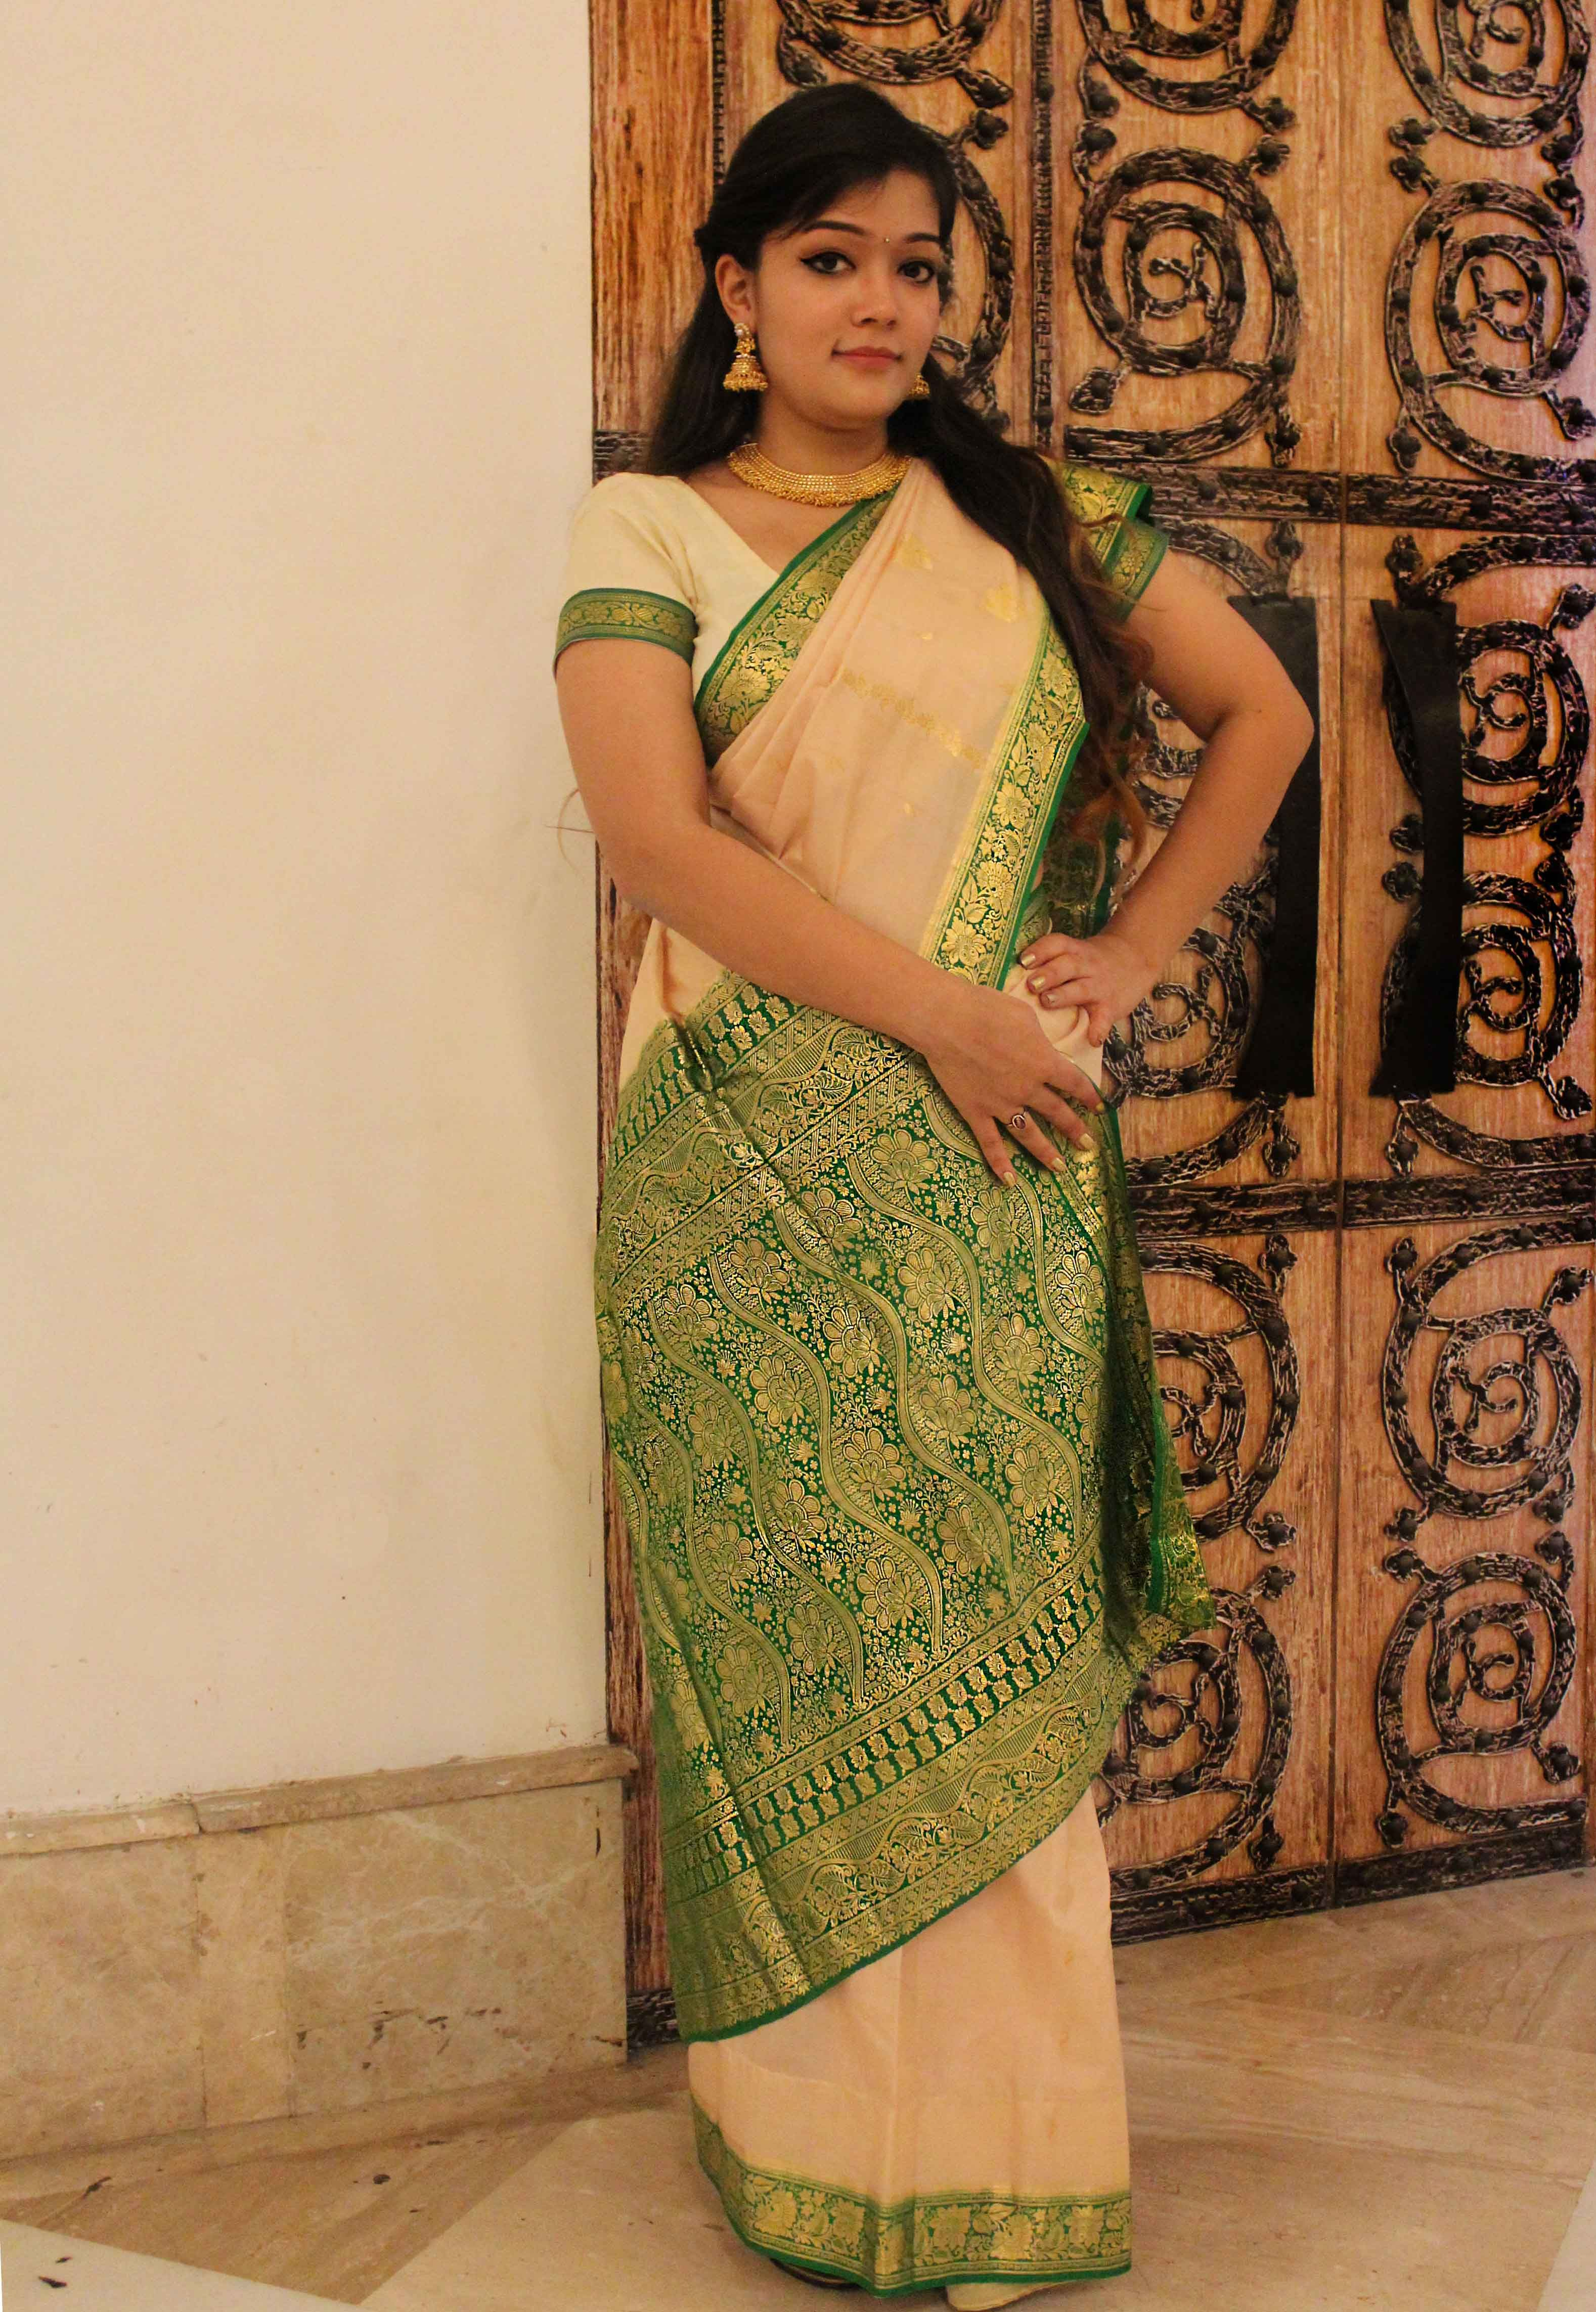 Cream Silk Saree with Green and gold border | Fashion Fab ...